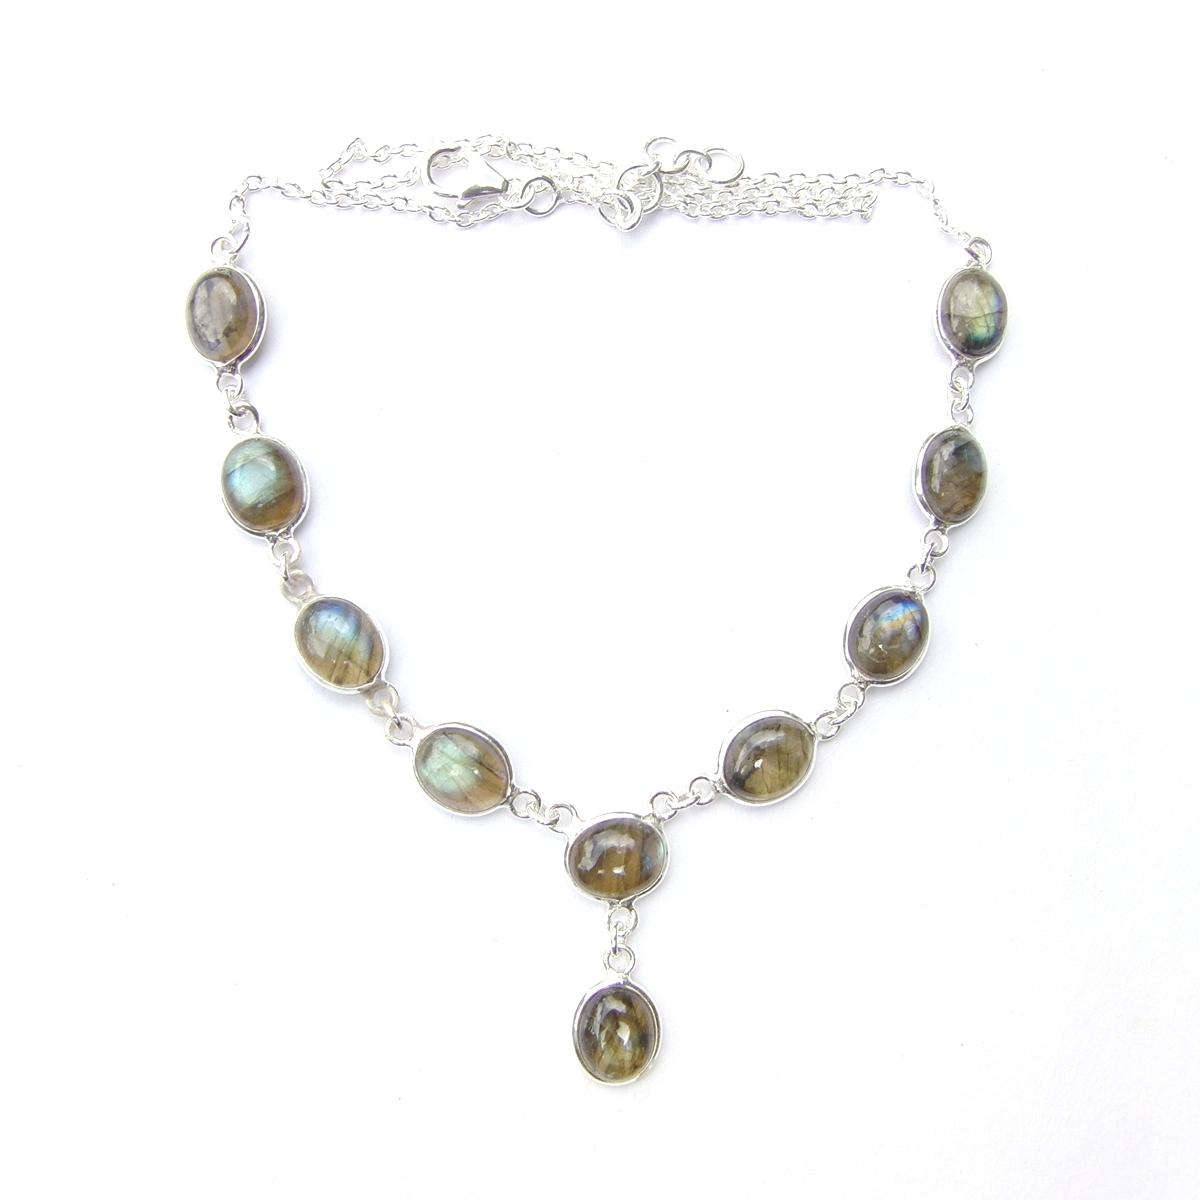 Labradorite Large Oval Necklace.